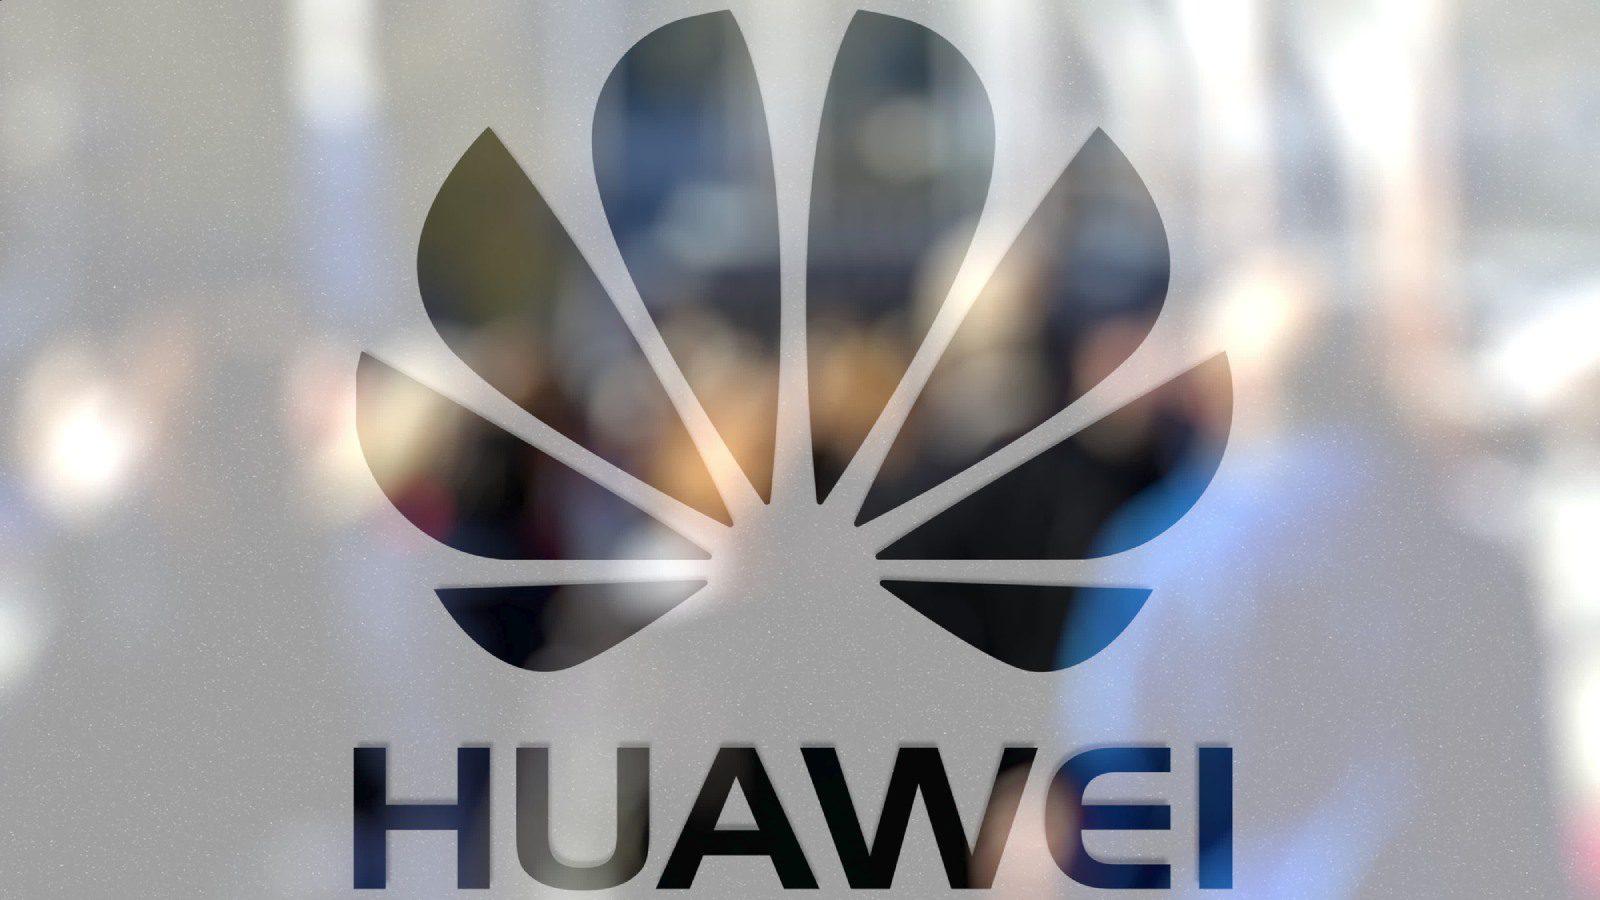 Huawei Intelligence